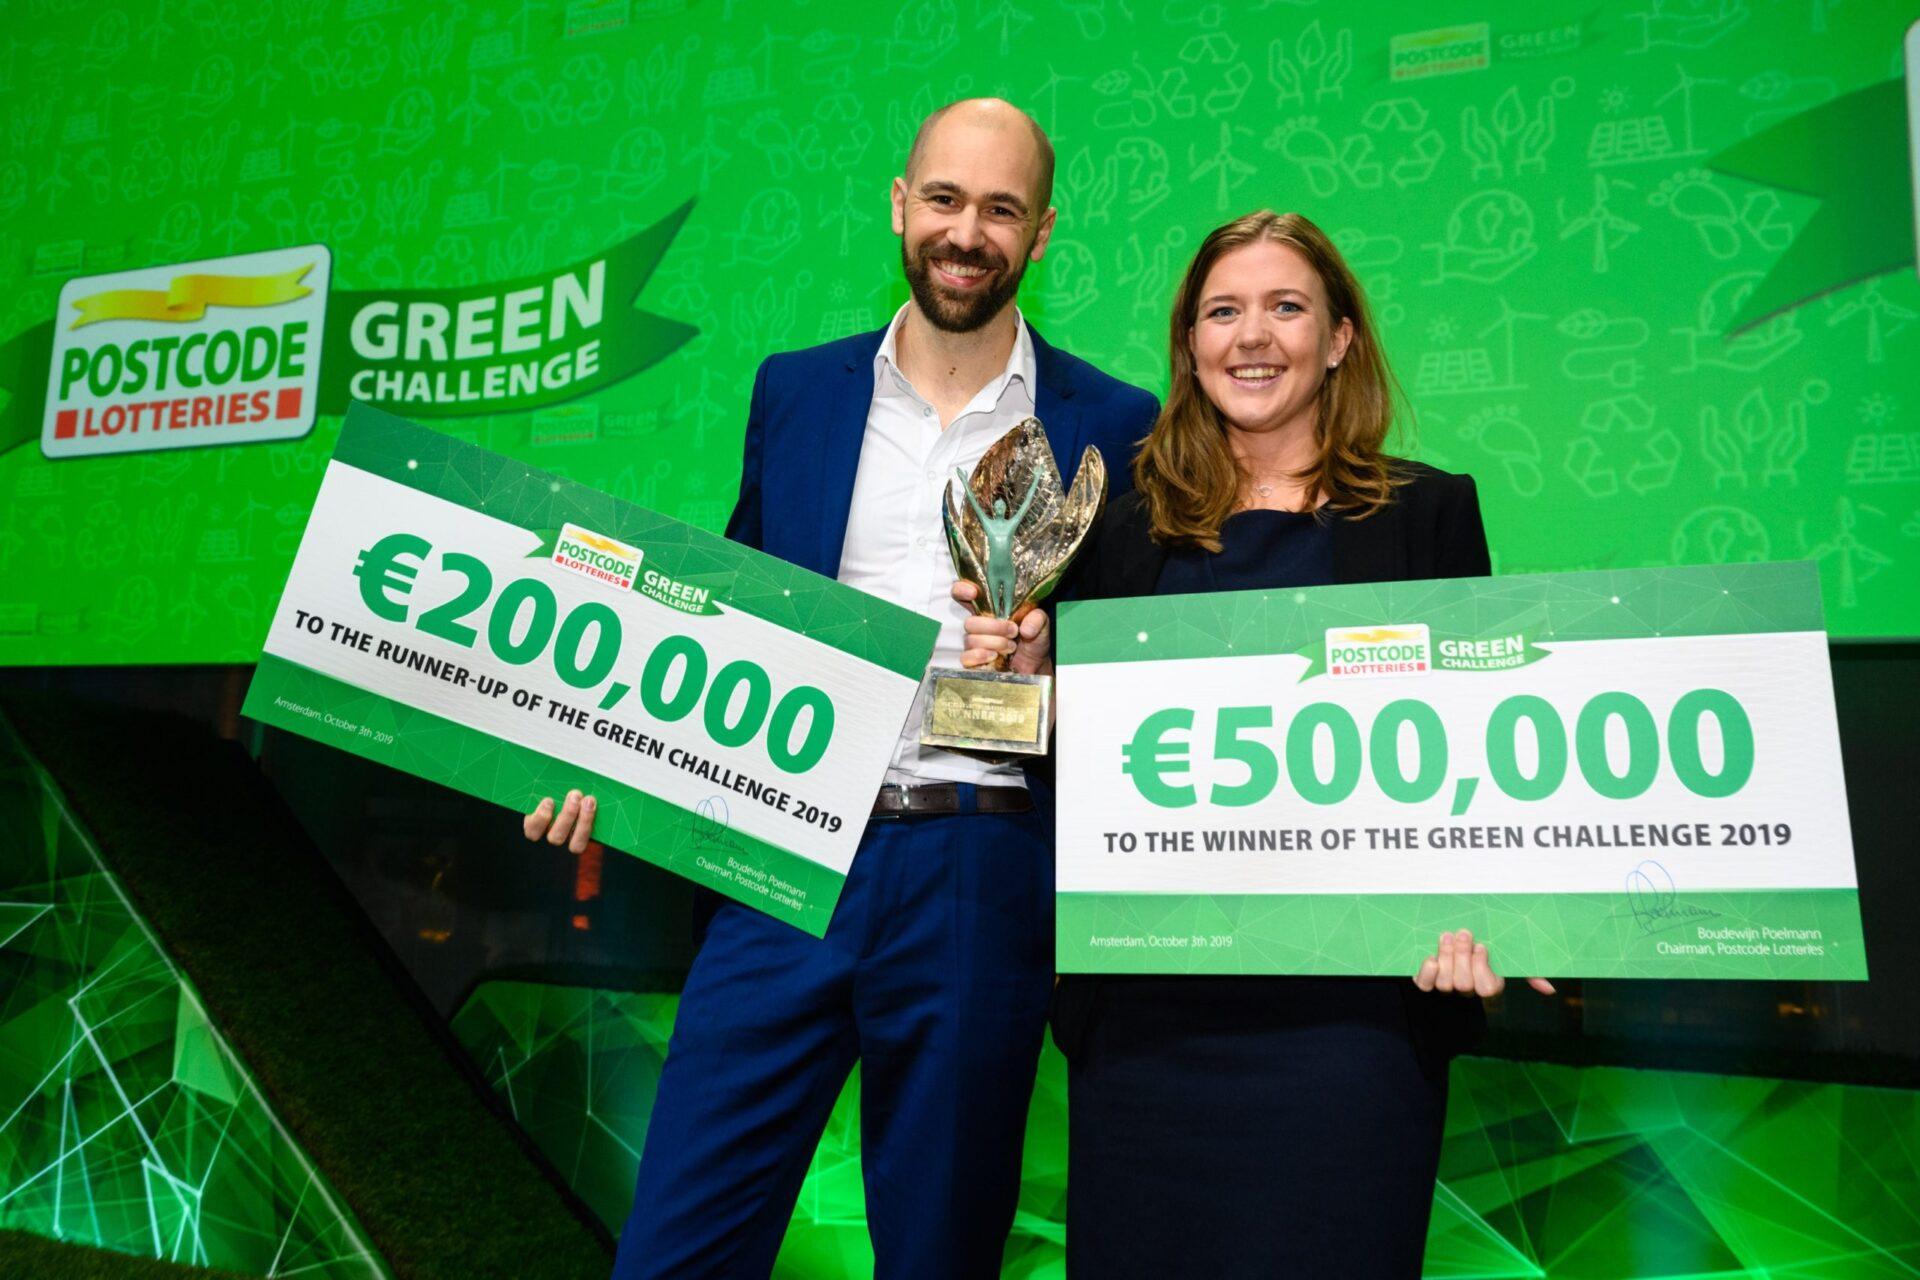 Postcode Lotteries Green Challenge winners